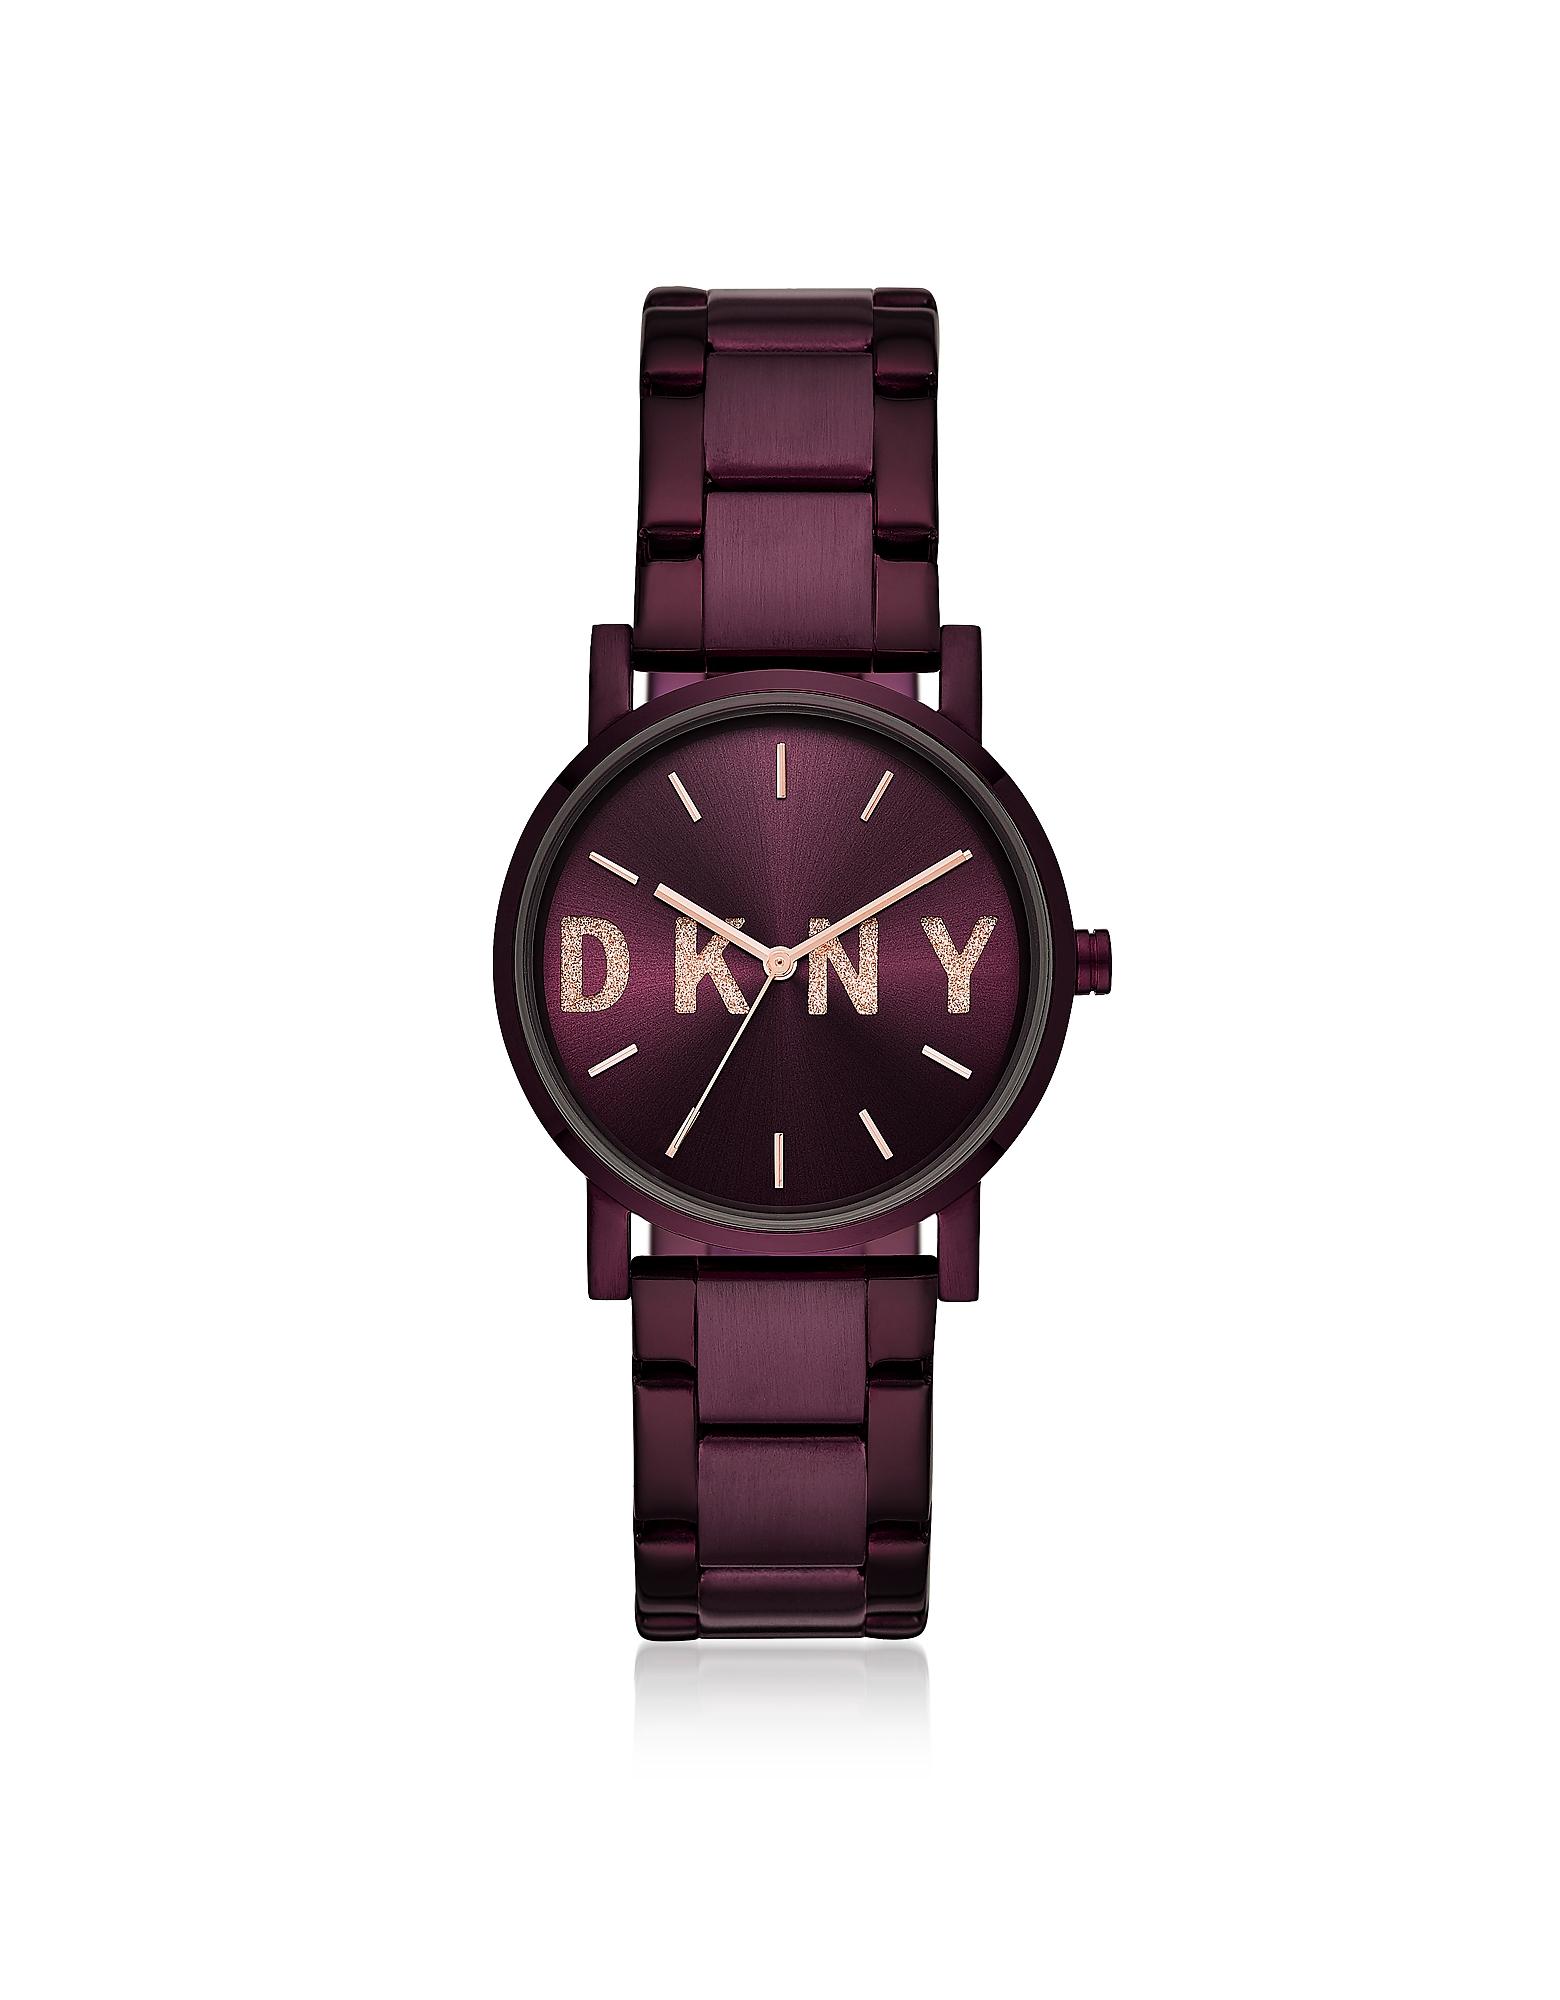 DKNY Women's Watches, Soho Purple Tone Signature Glitz Watch